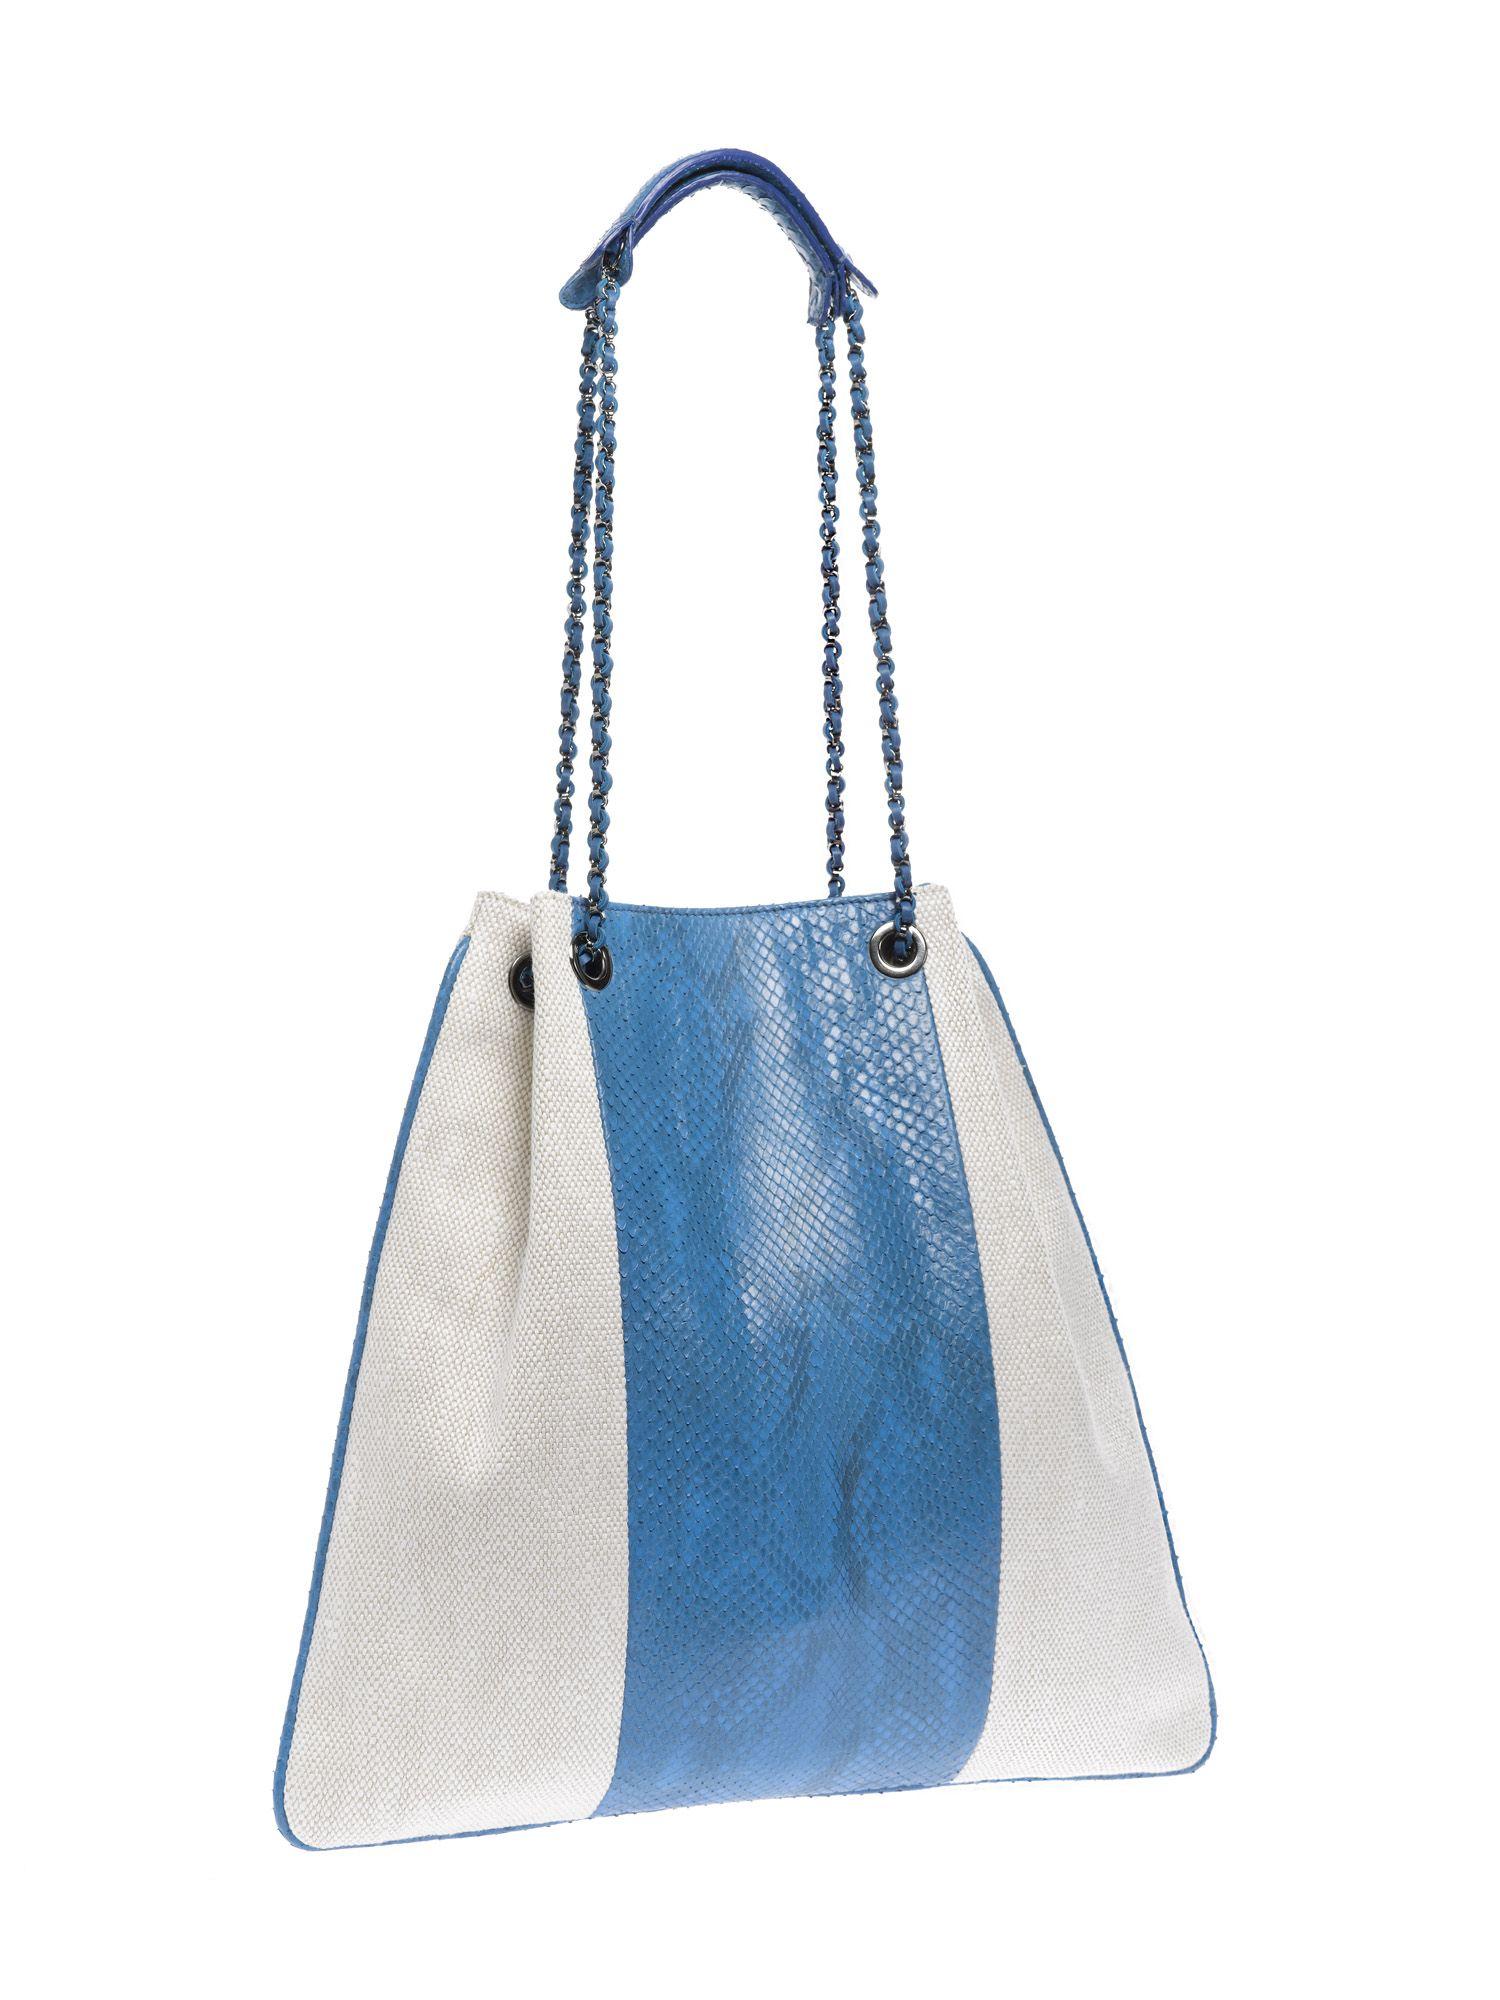 Gramercy - Hamptons Collection - Azul